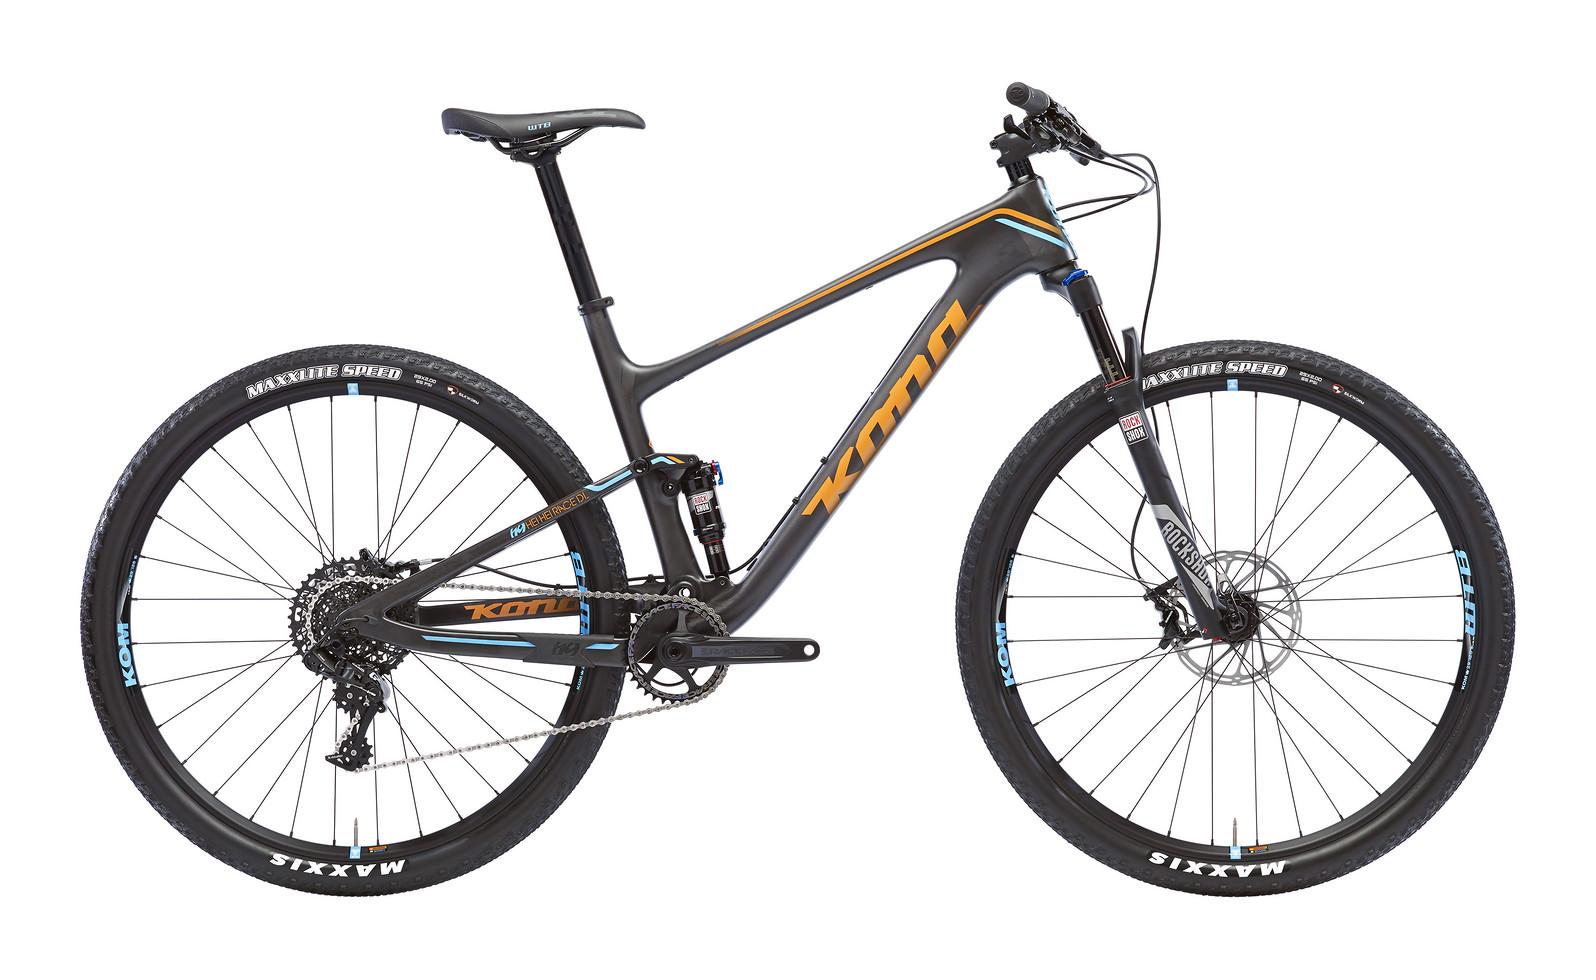 2017 Kona Hei Hei Race DL 29 Bike